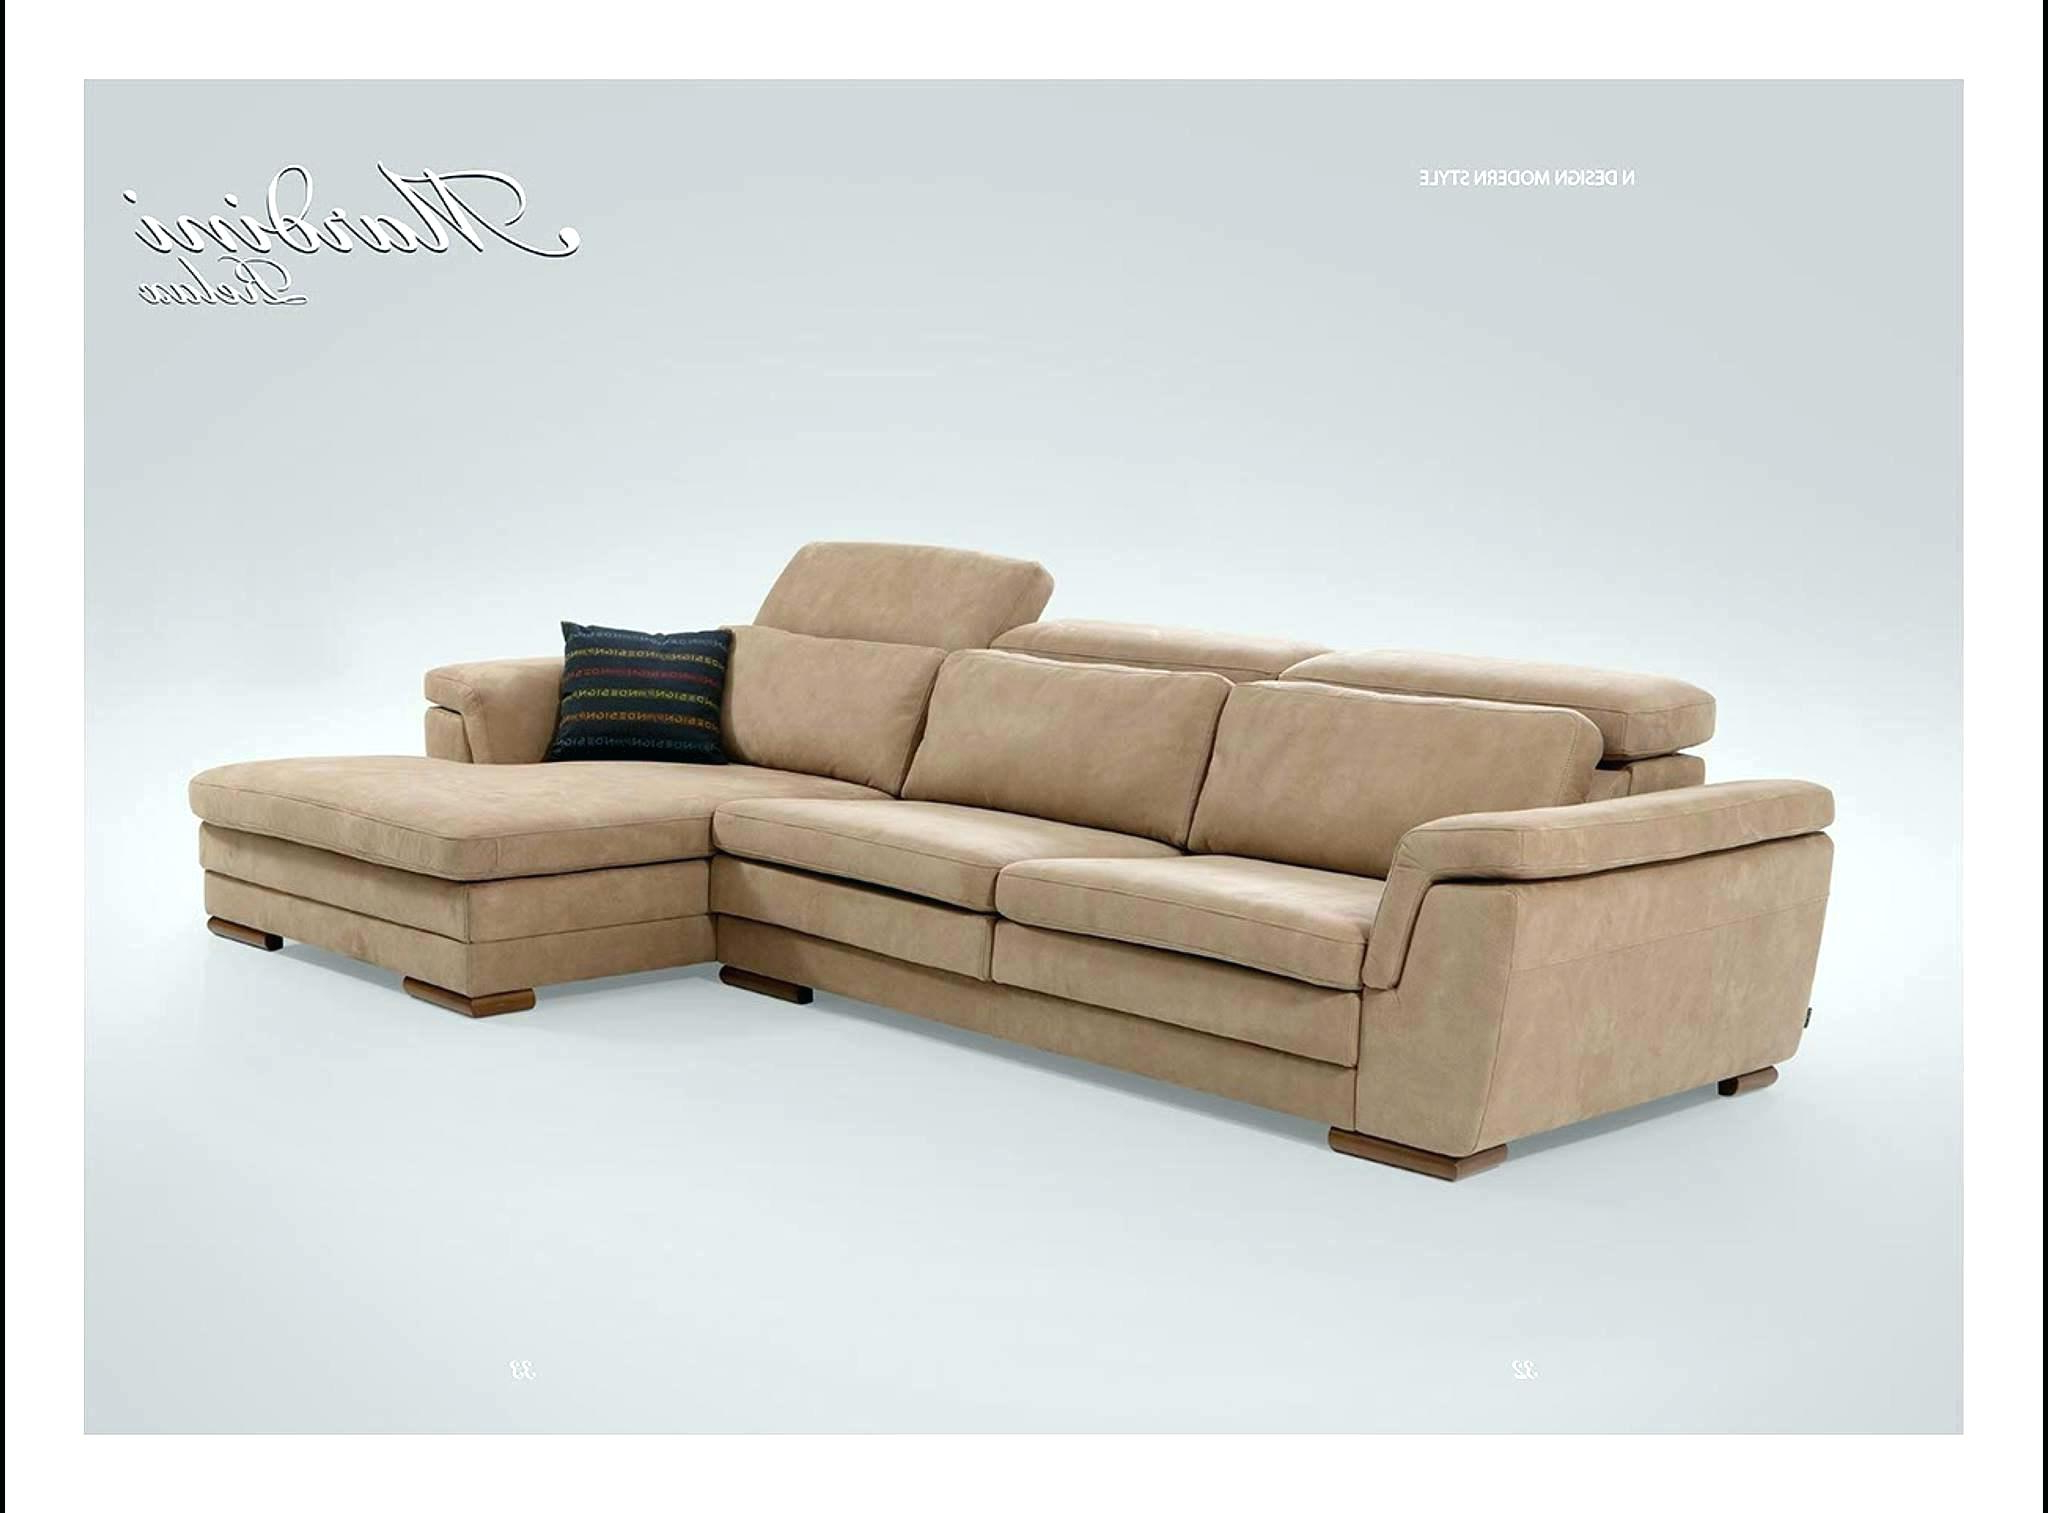 Sofa Relax Ikea Mndw sofas Relax Relaxsofa sofas Relax Ikea sofas Relax Piel Corte Ingles